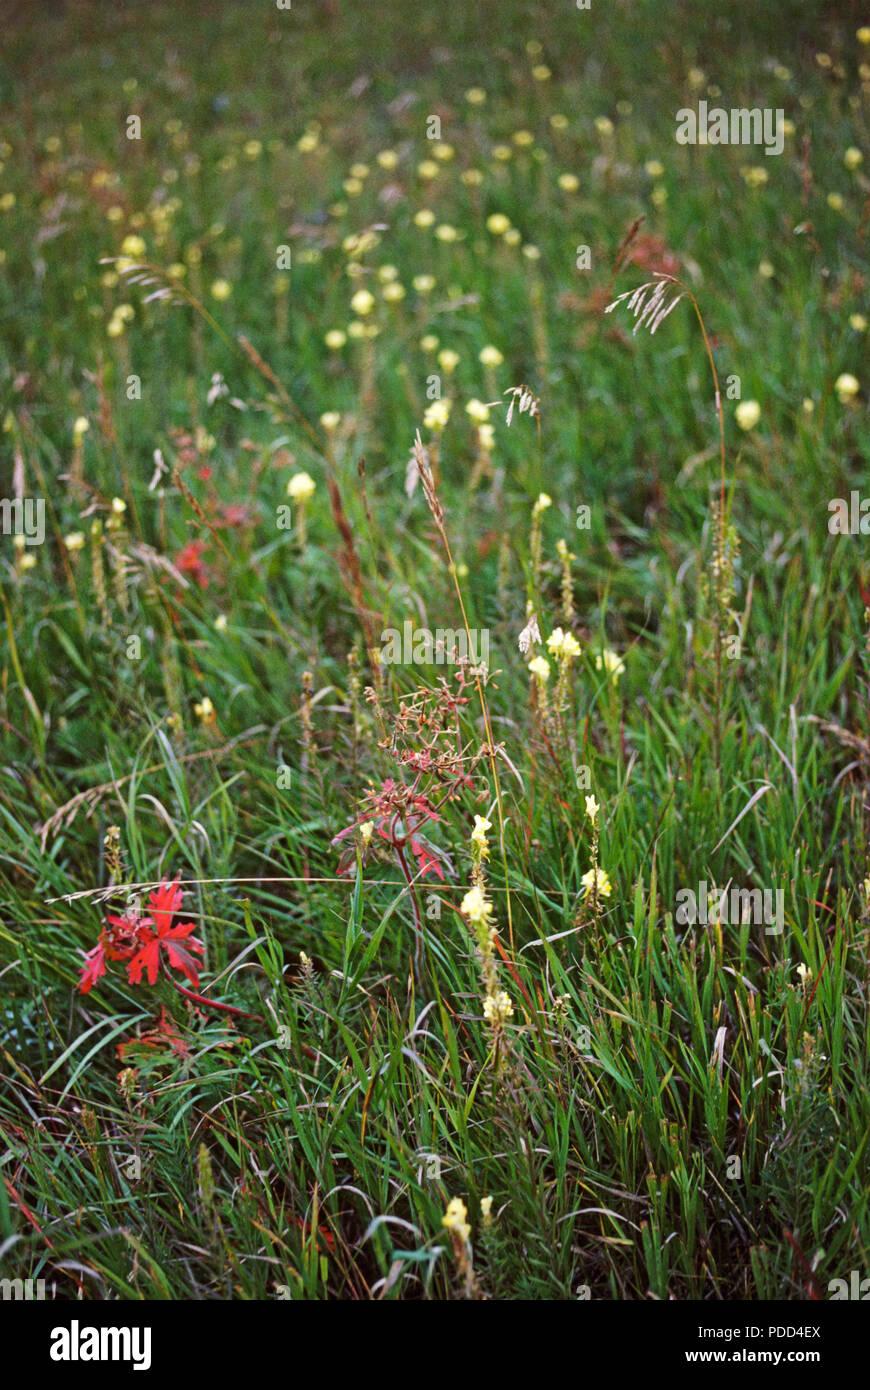 Prairie grasses and wildflowers, eastern Montana - Stock Image